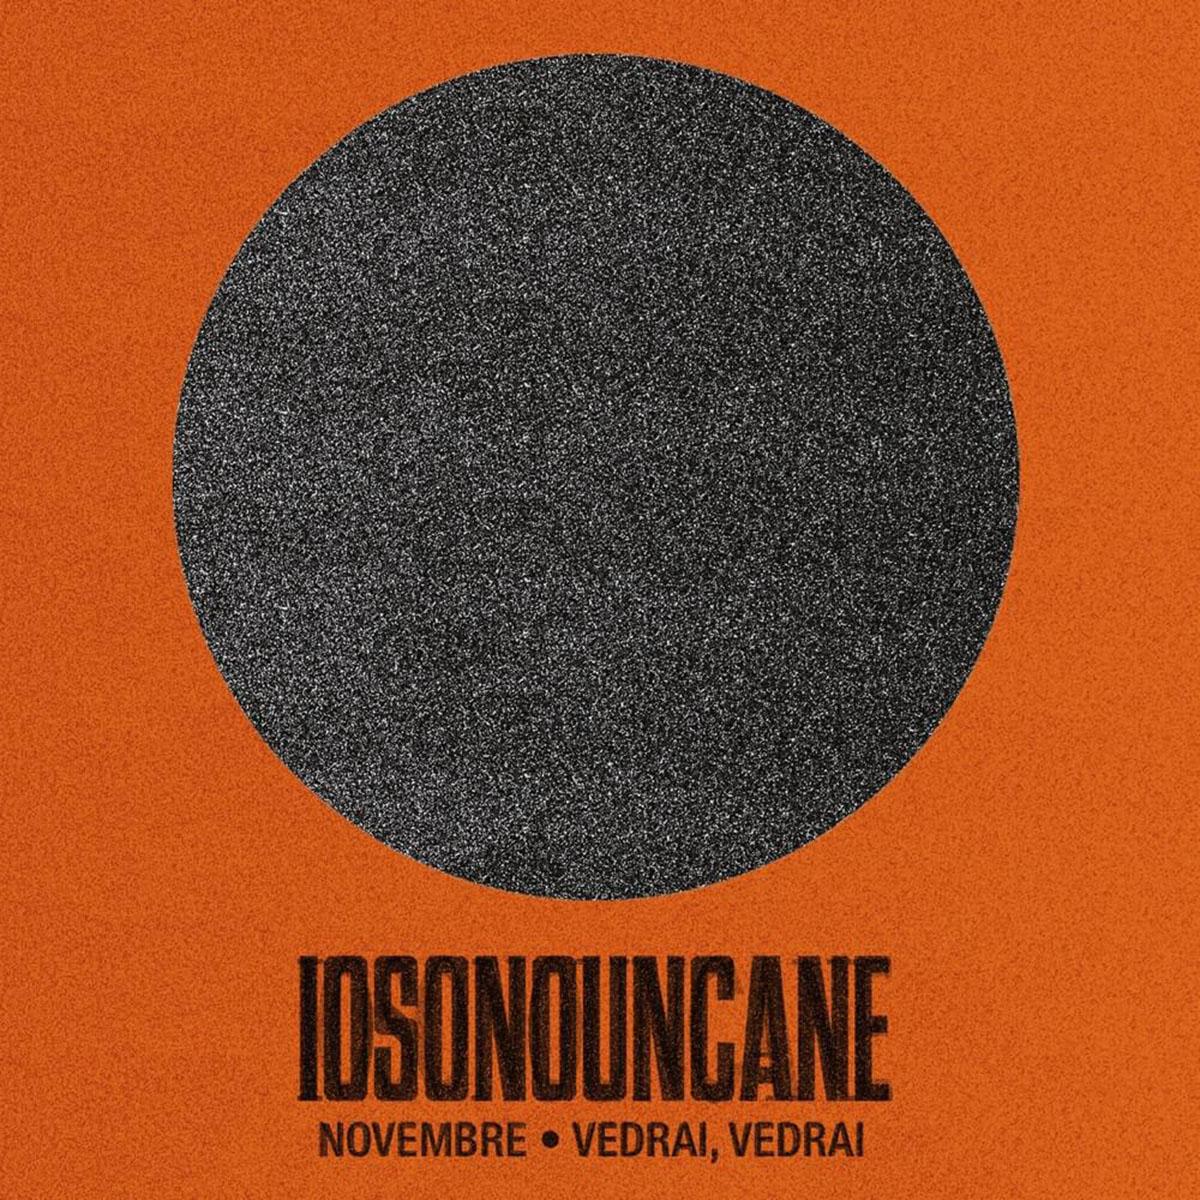 Iosonouncane - Novembre